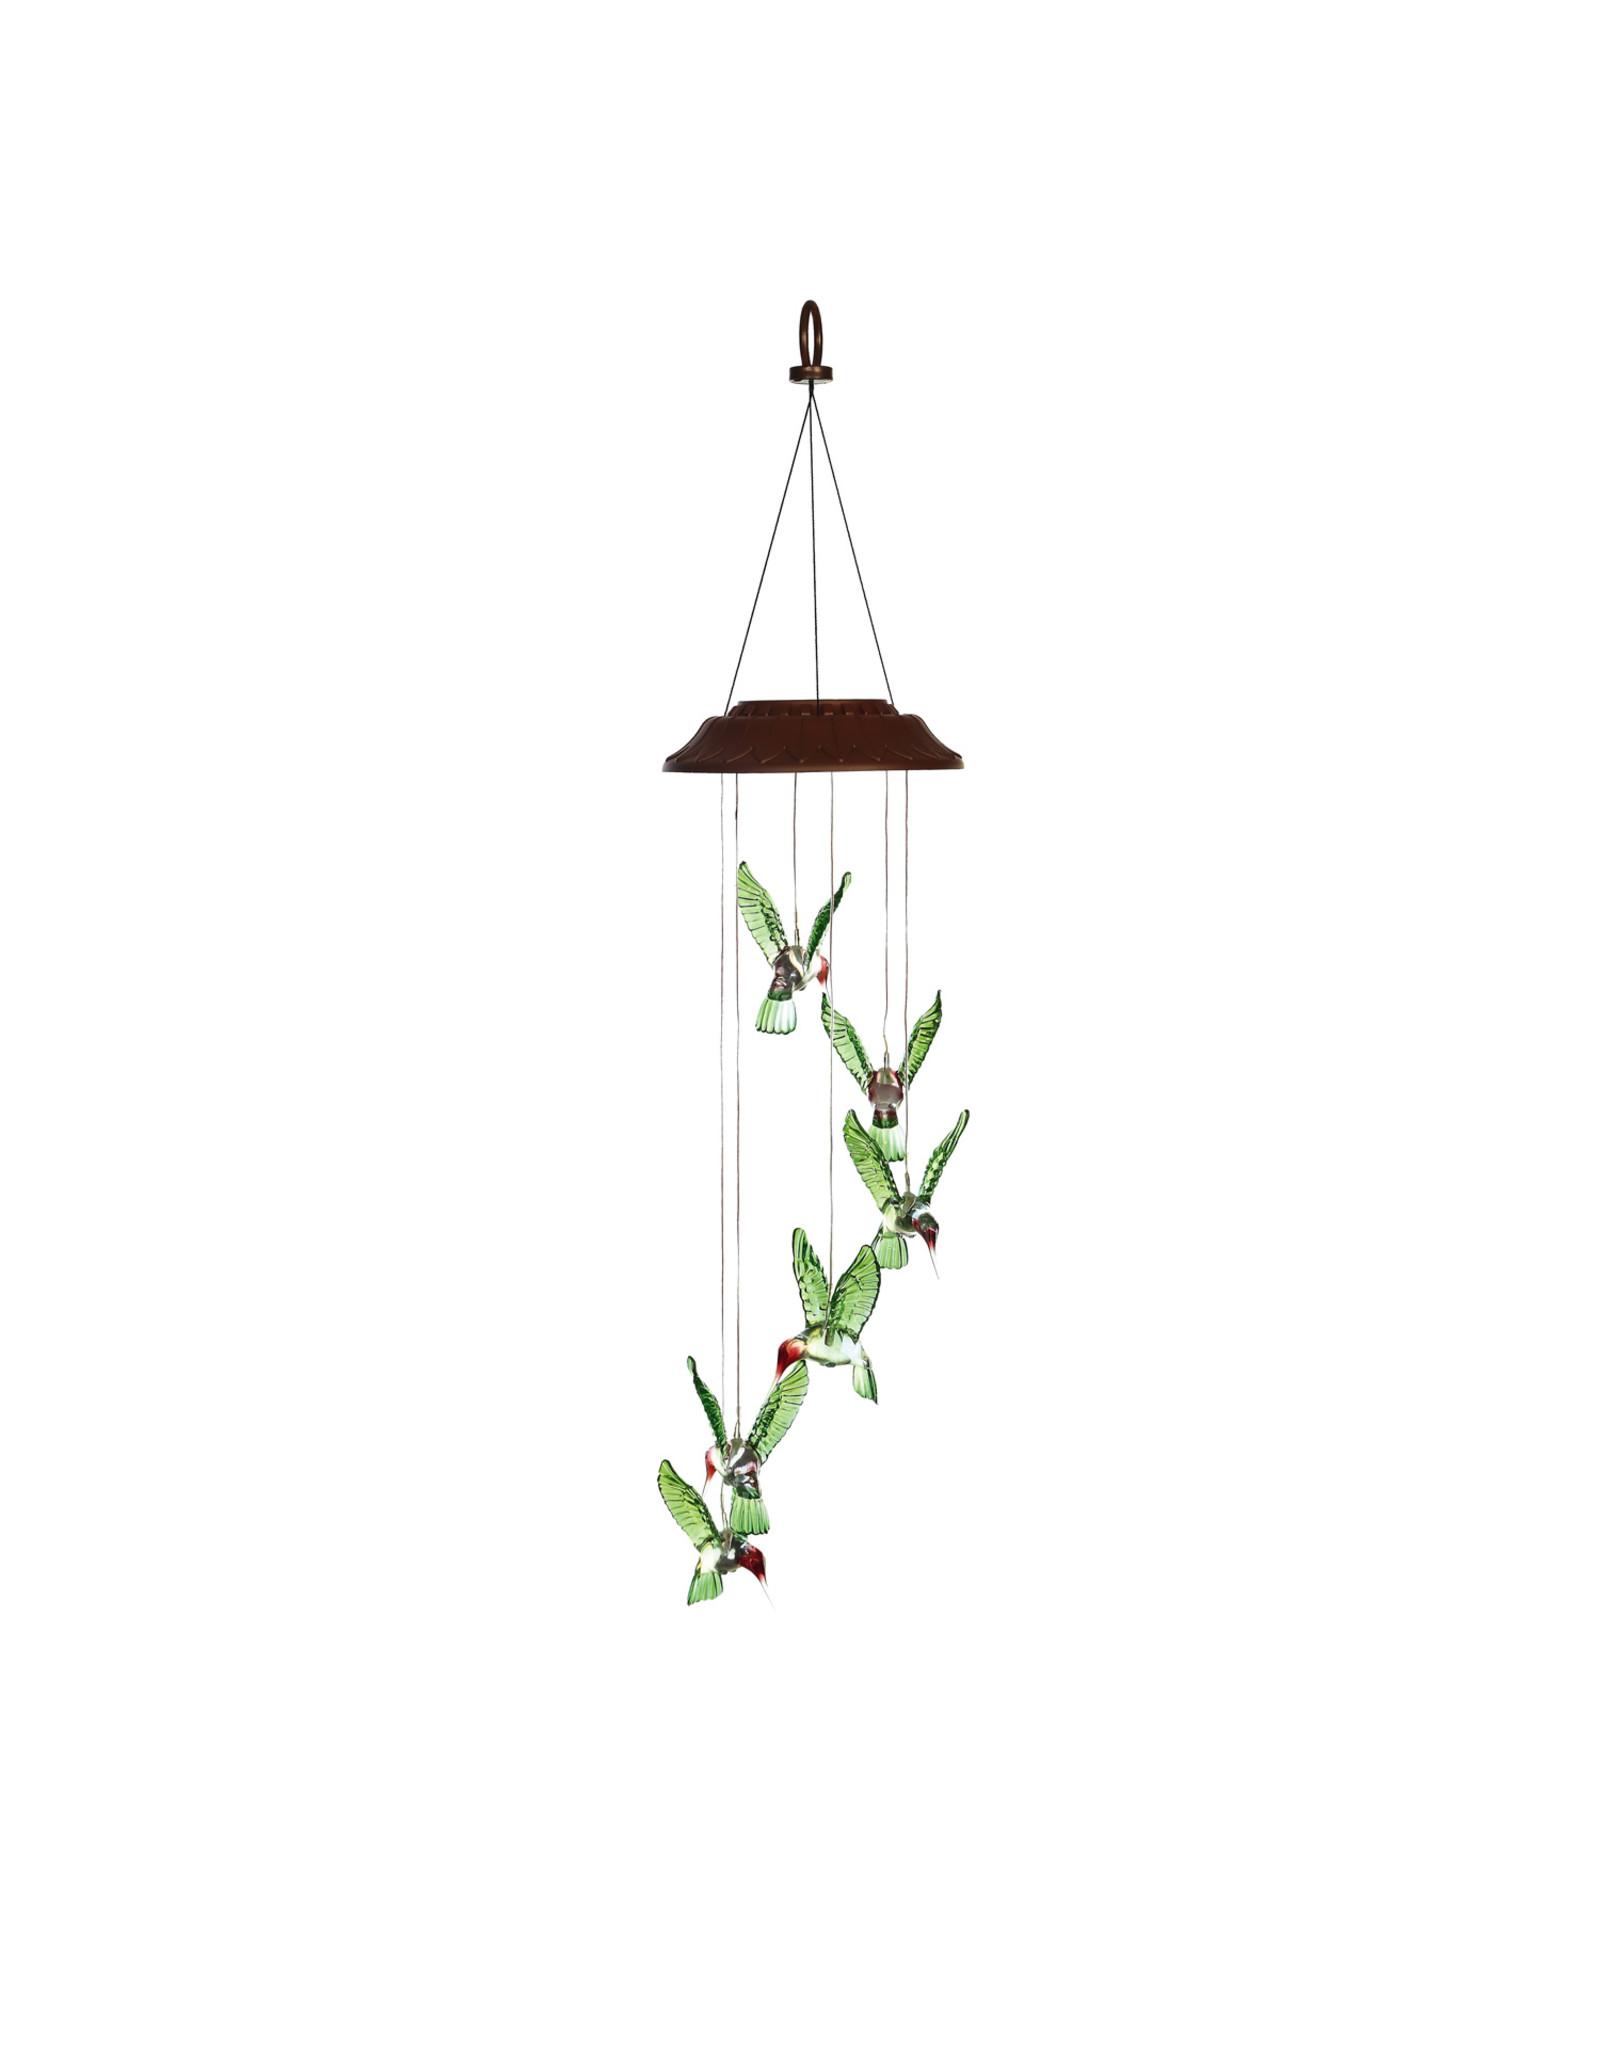 Evergreen HUMMINGBIRD SOLAR MOBILE